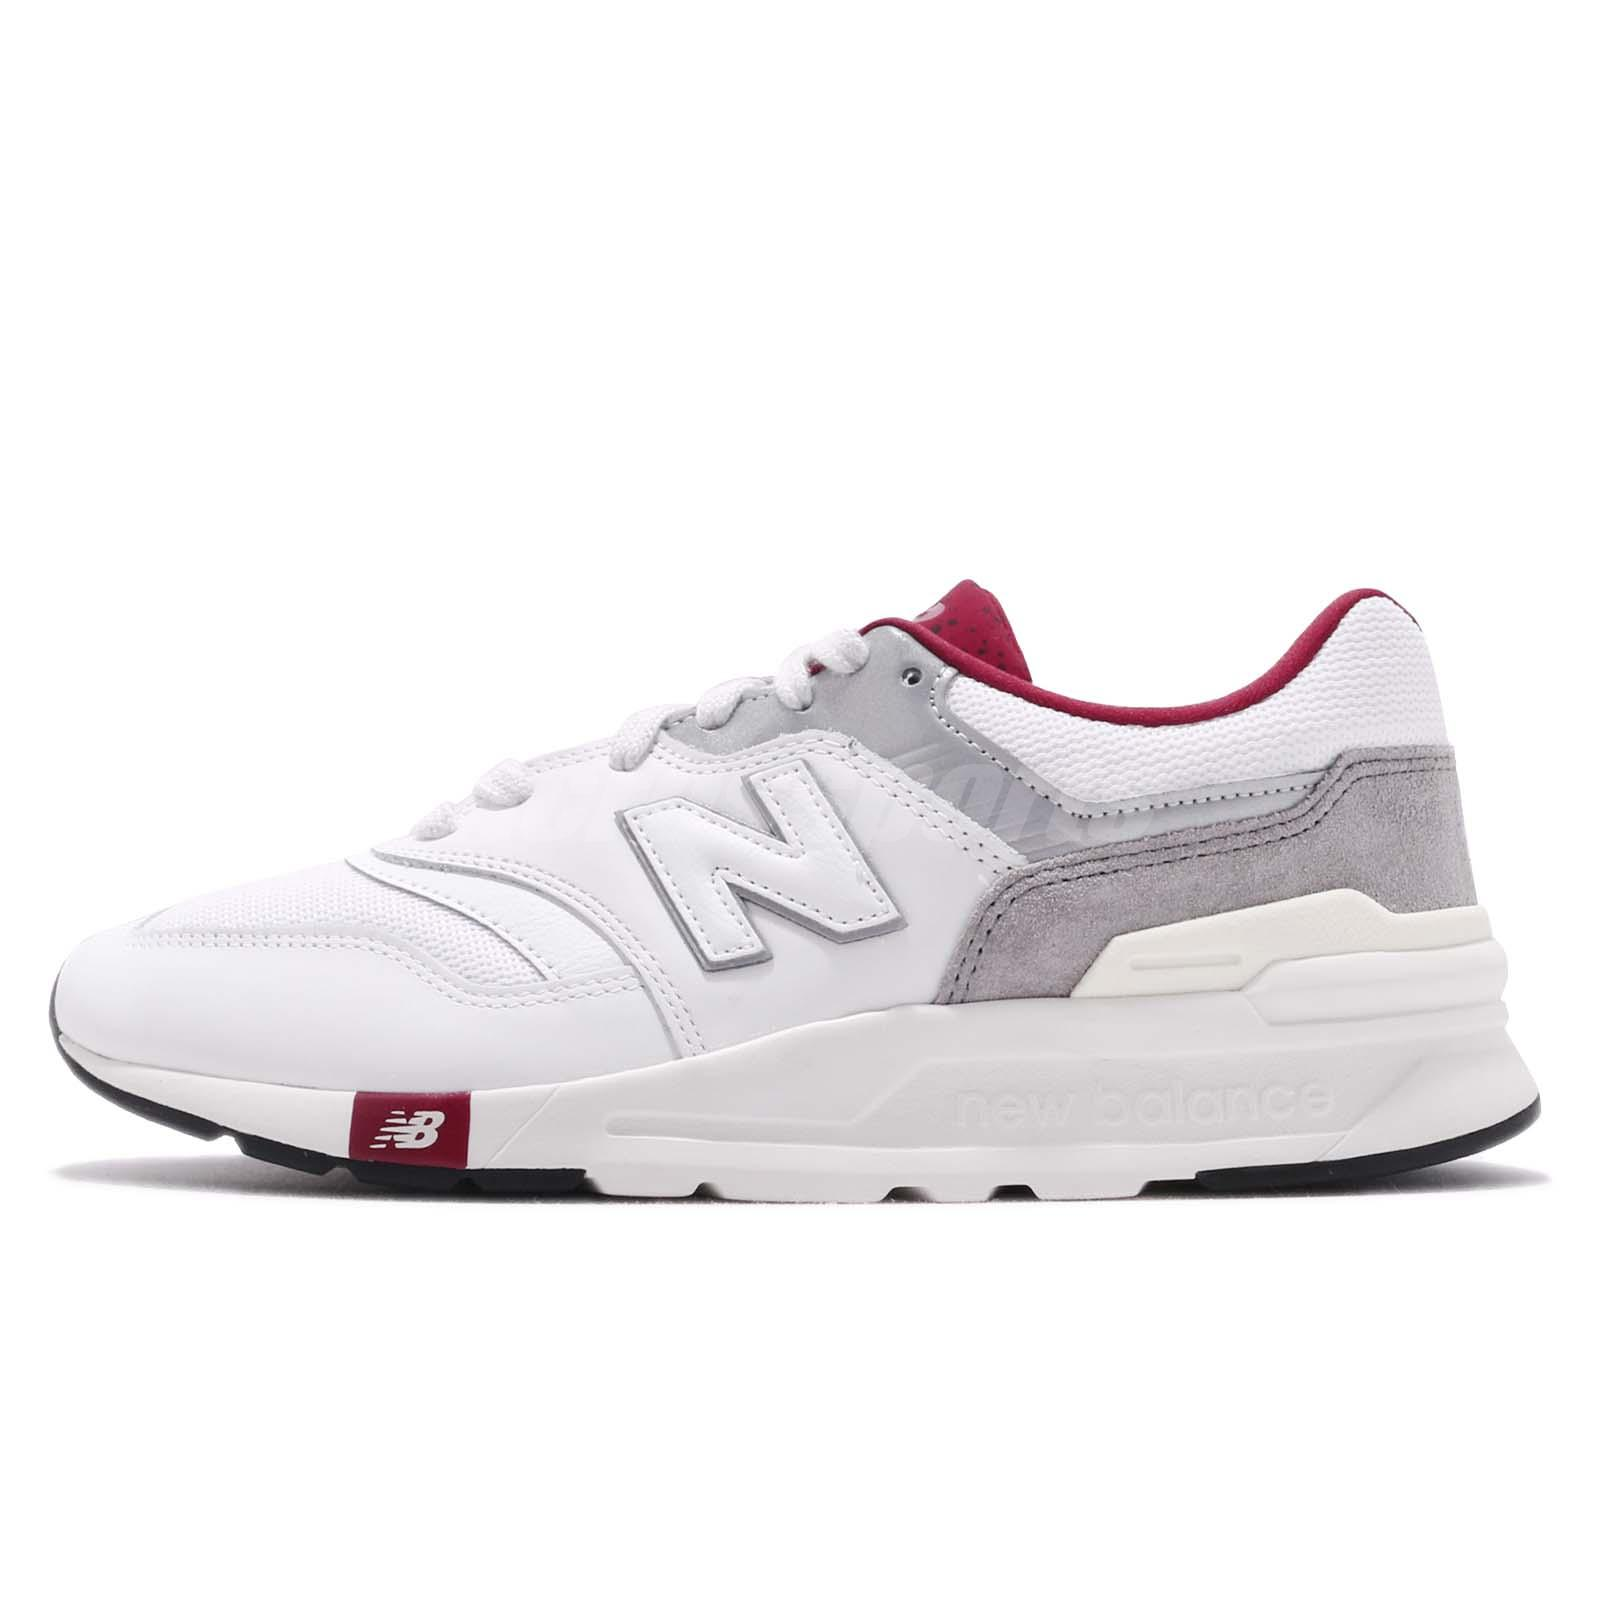 b6c31ca46e6da Details about New Balance 997 White Grey Red Mens Classic Retro Running  Shoes CM997HGA D